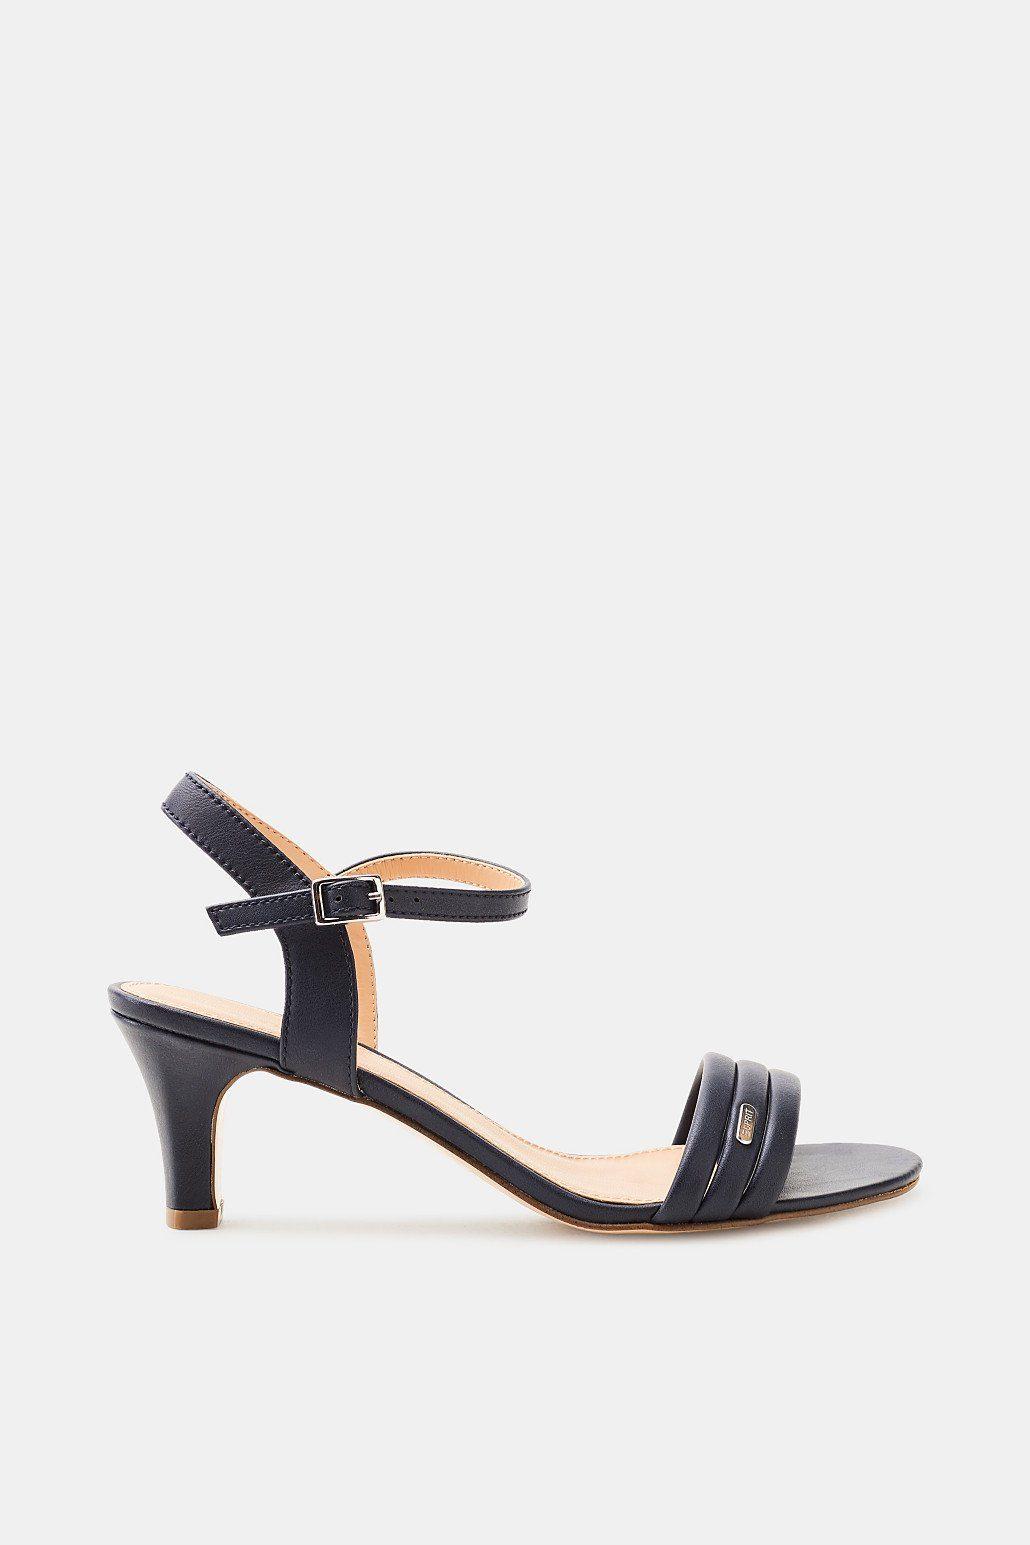 Esprit Sandalette in glatter Leder-Optik für Damen, Größe 39, Navy